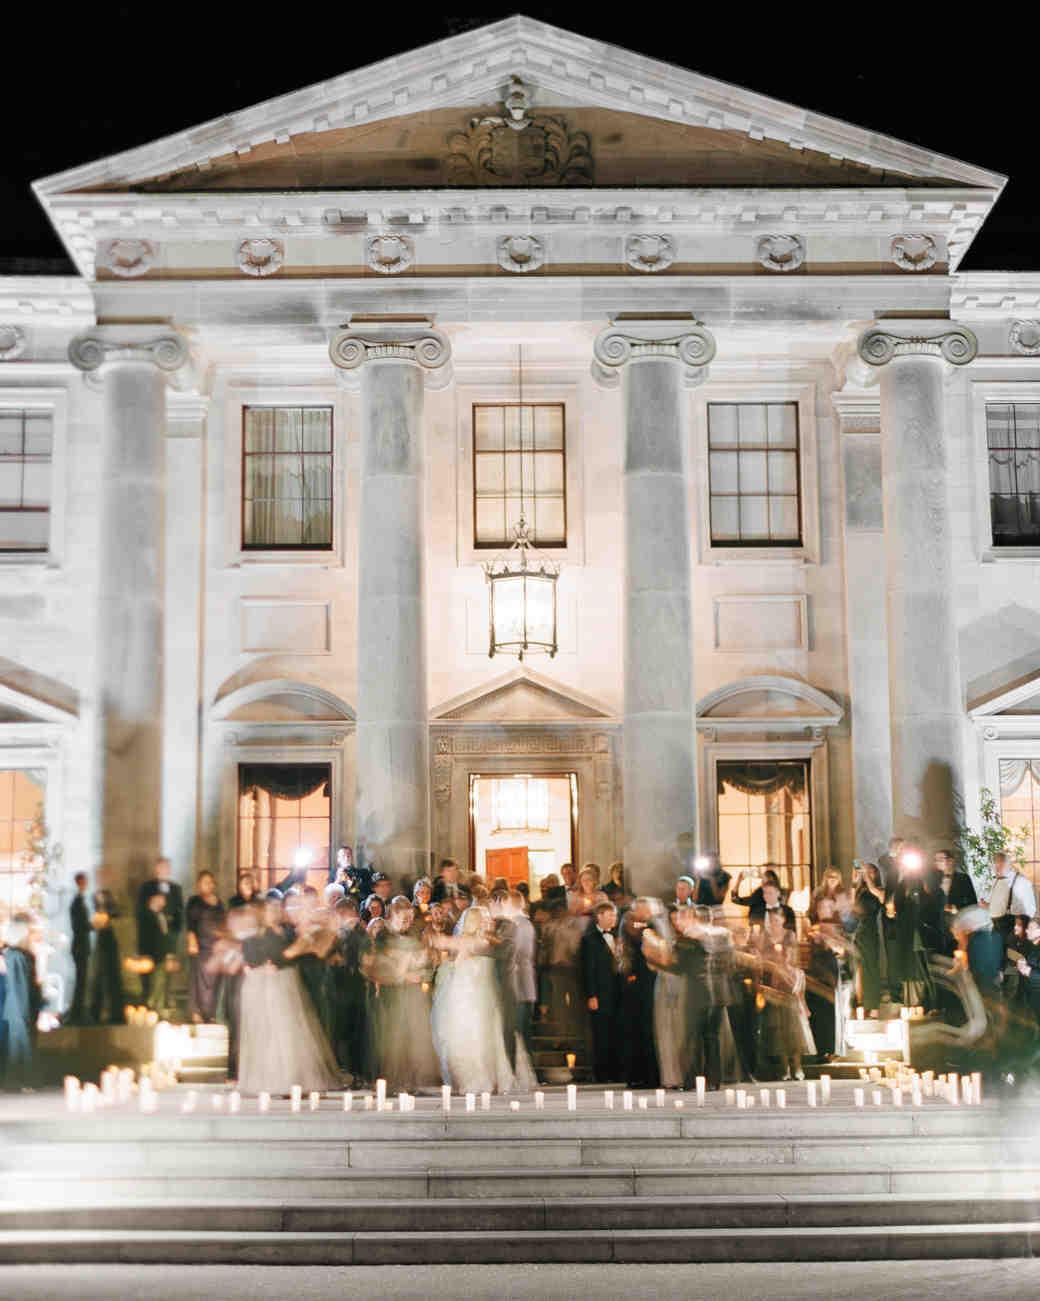 jo-andrew-wedding-ireland-2157-s112147.jpg